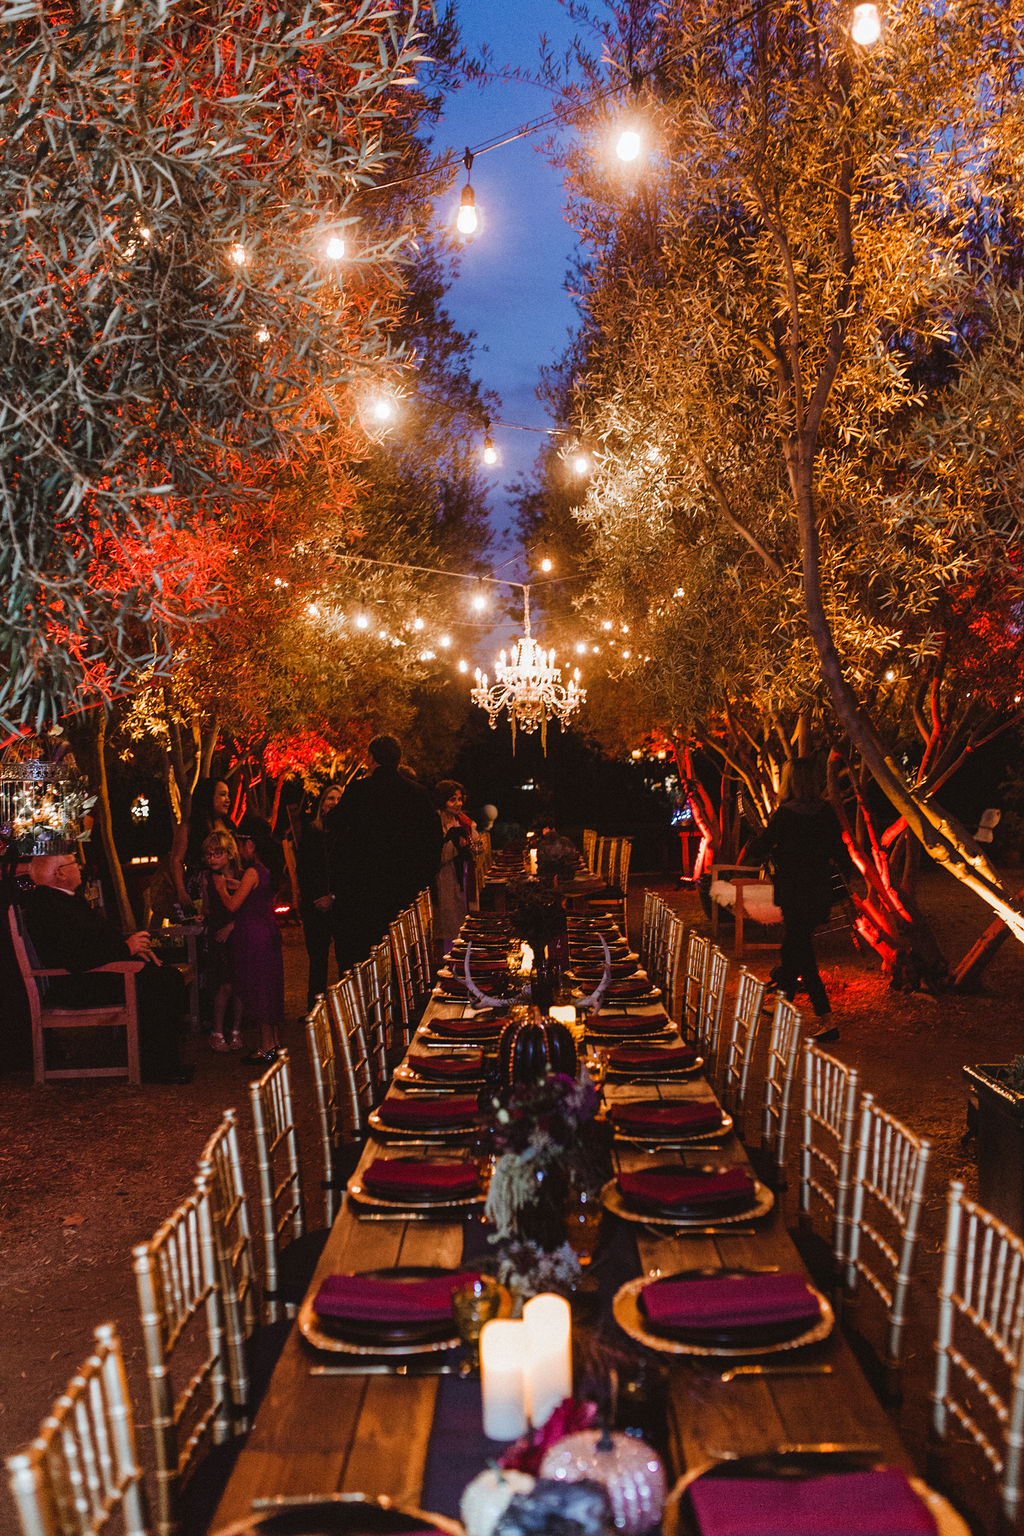 October-Details-Wedding-Pasadena-California-Halloween-Tim-Burton-Alice-Wonderland-Whimsical-Hieusz-Photography-84.jpg